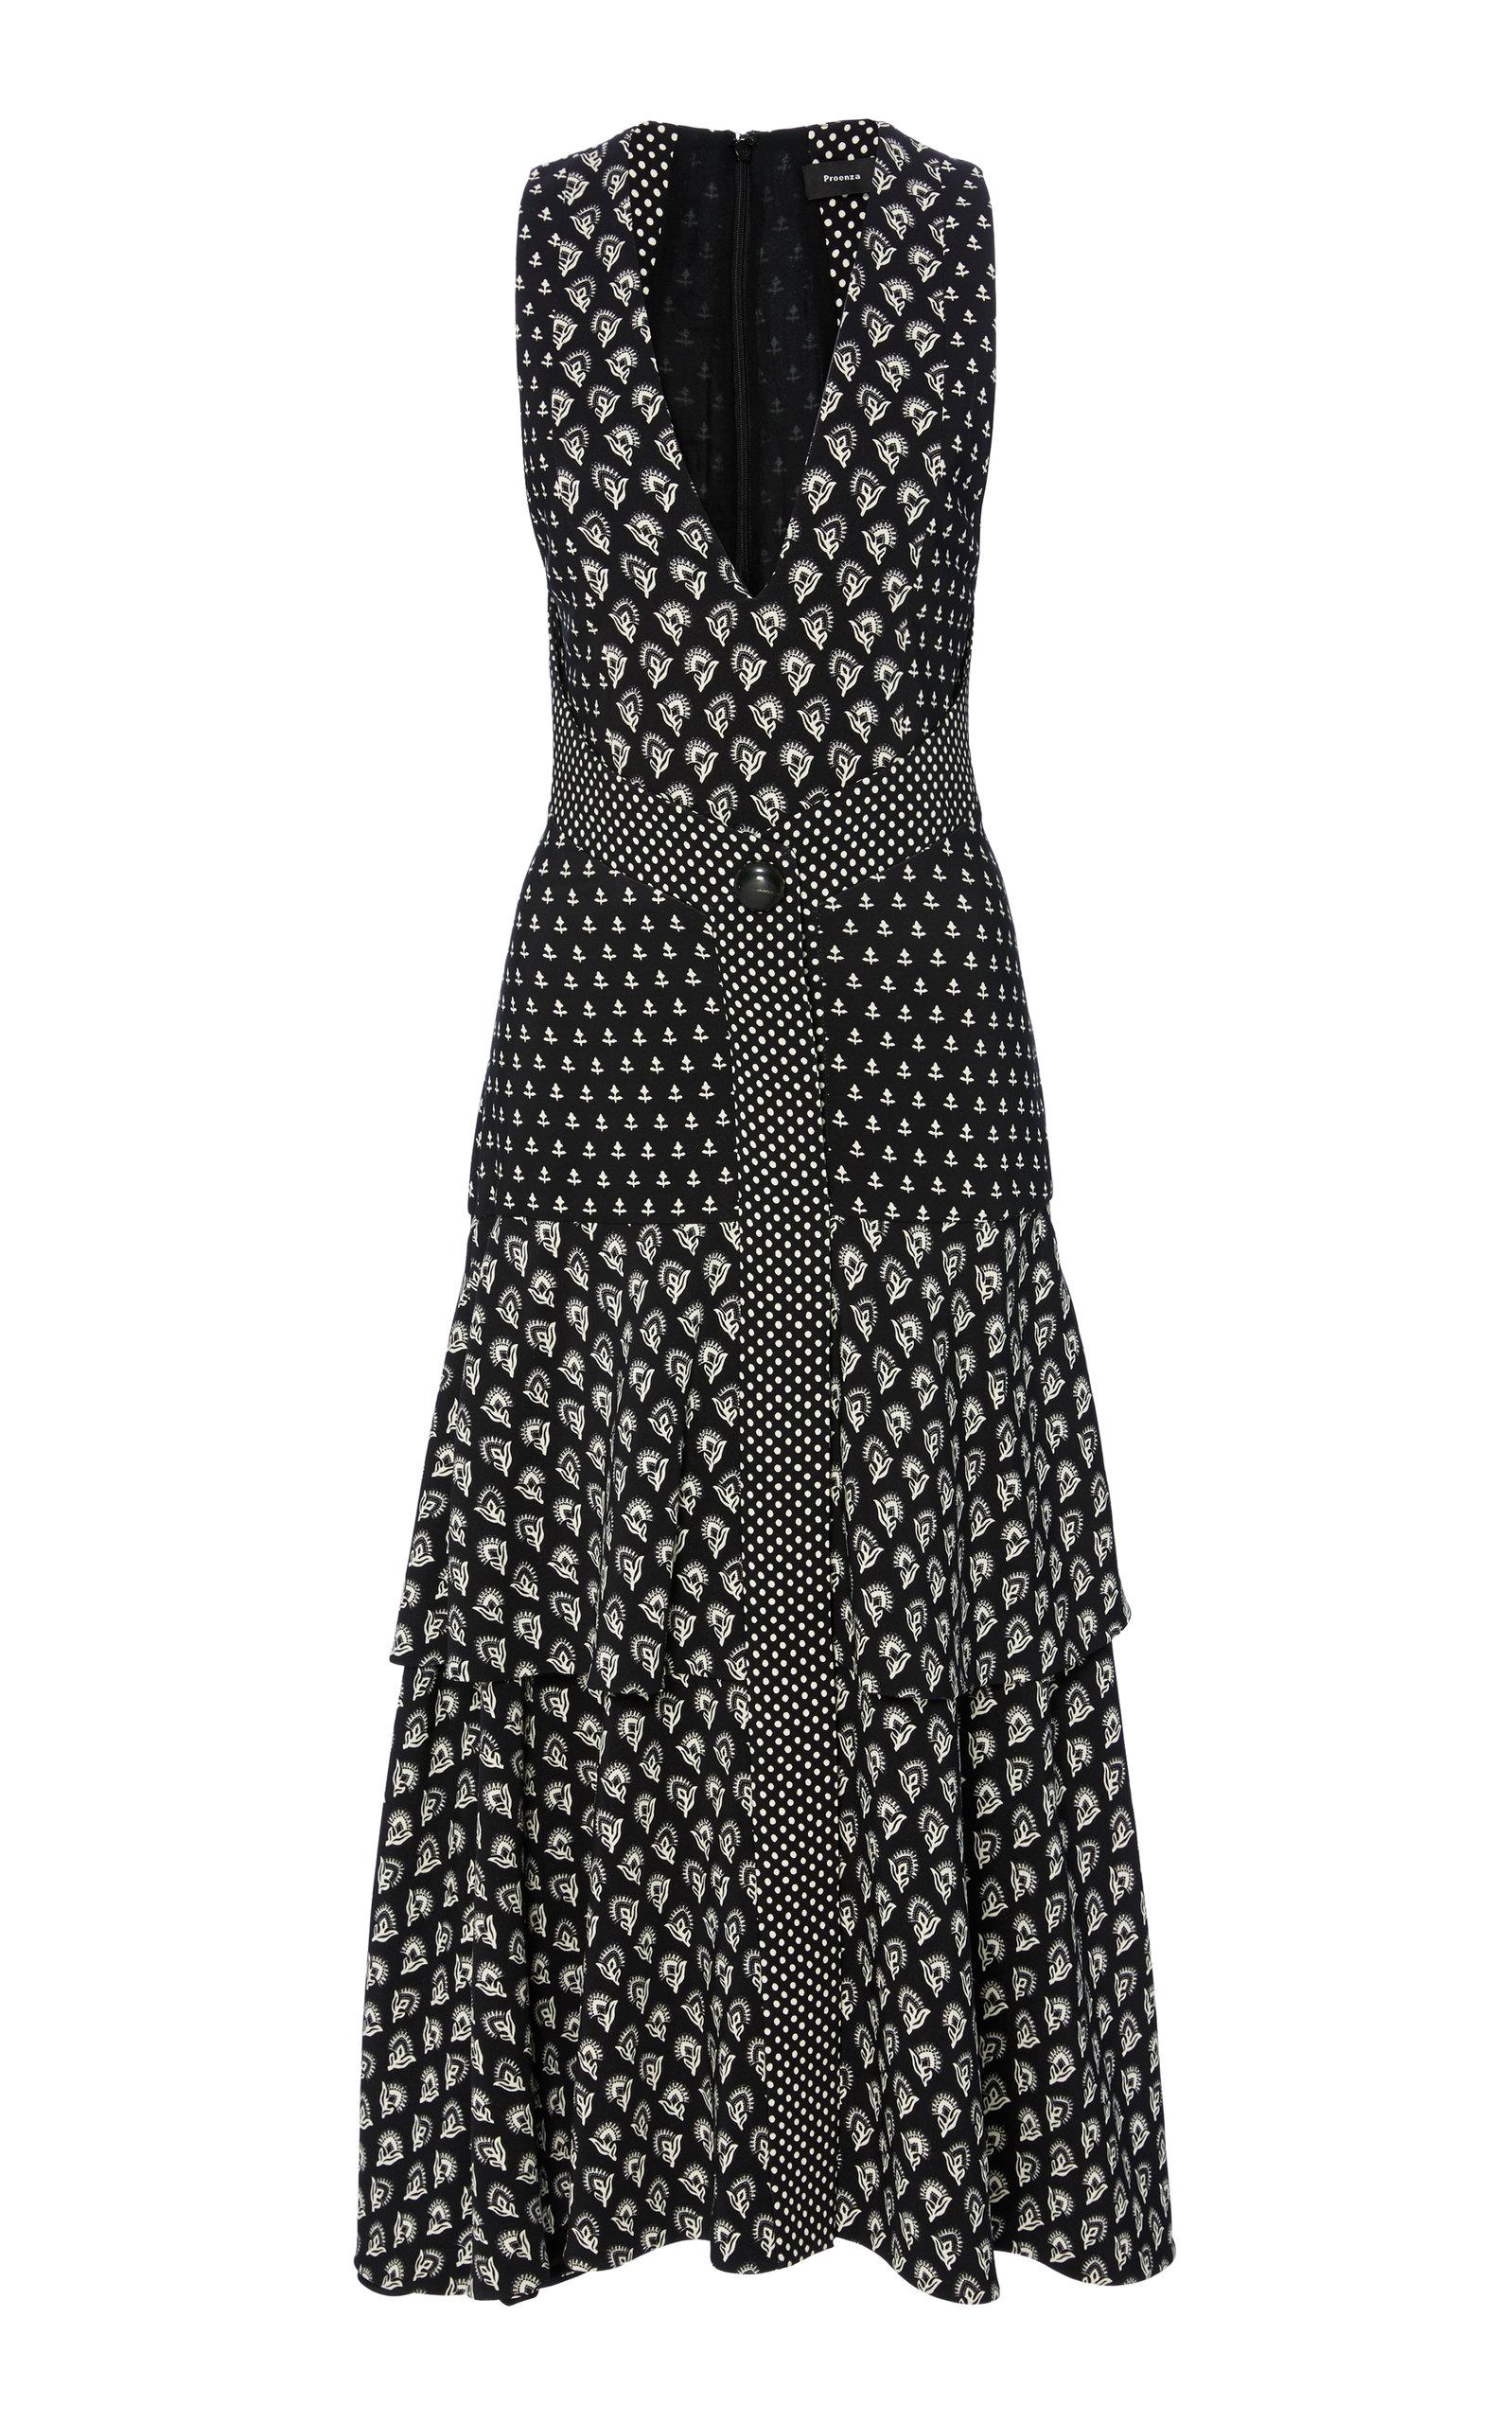 V-Neck Sleeveless Mixed-Print A-Line Midi Dress in Black